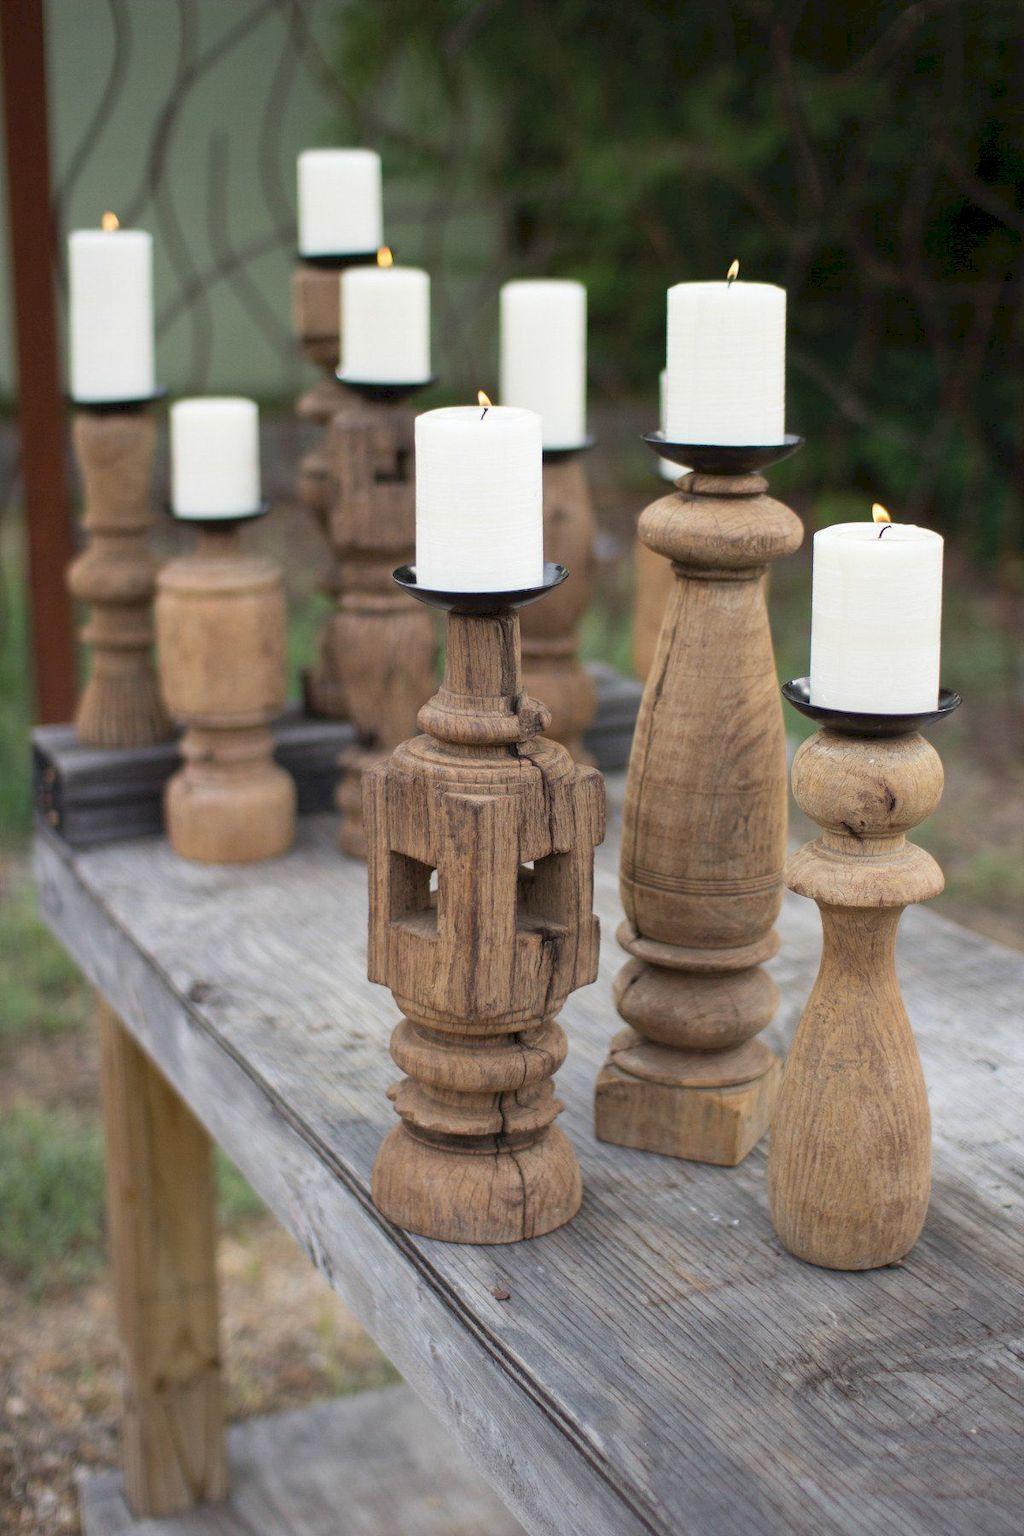 Wooden Furniture003